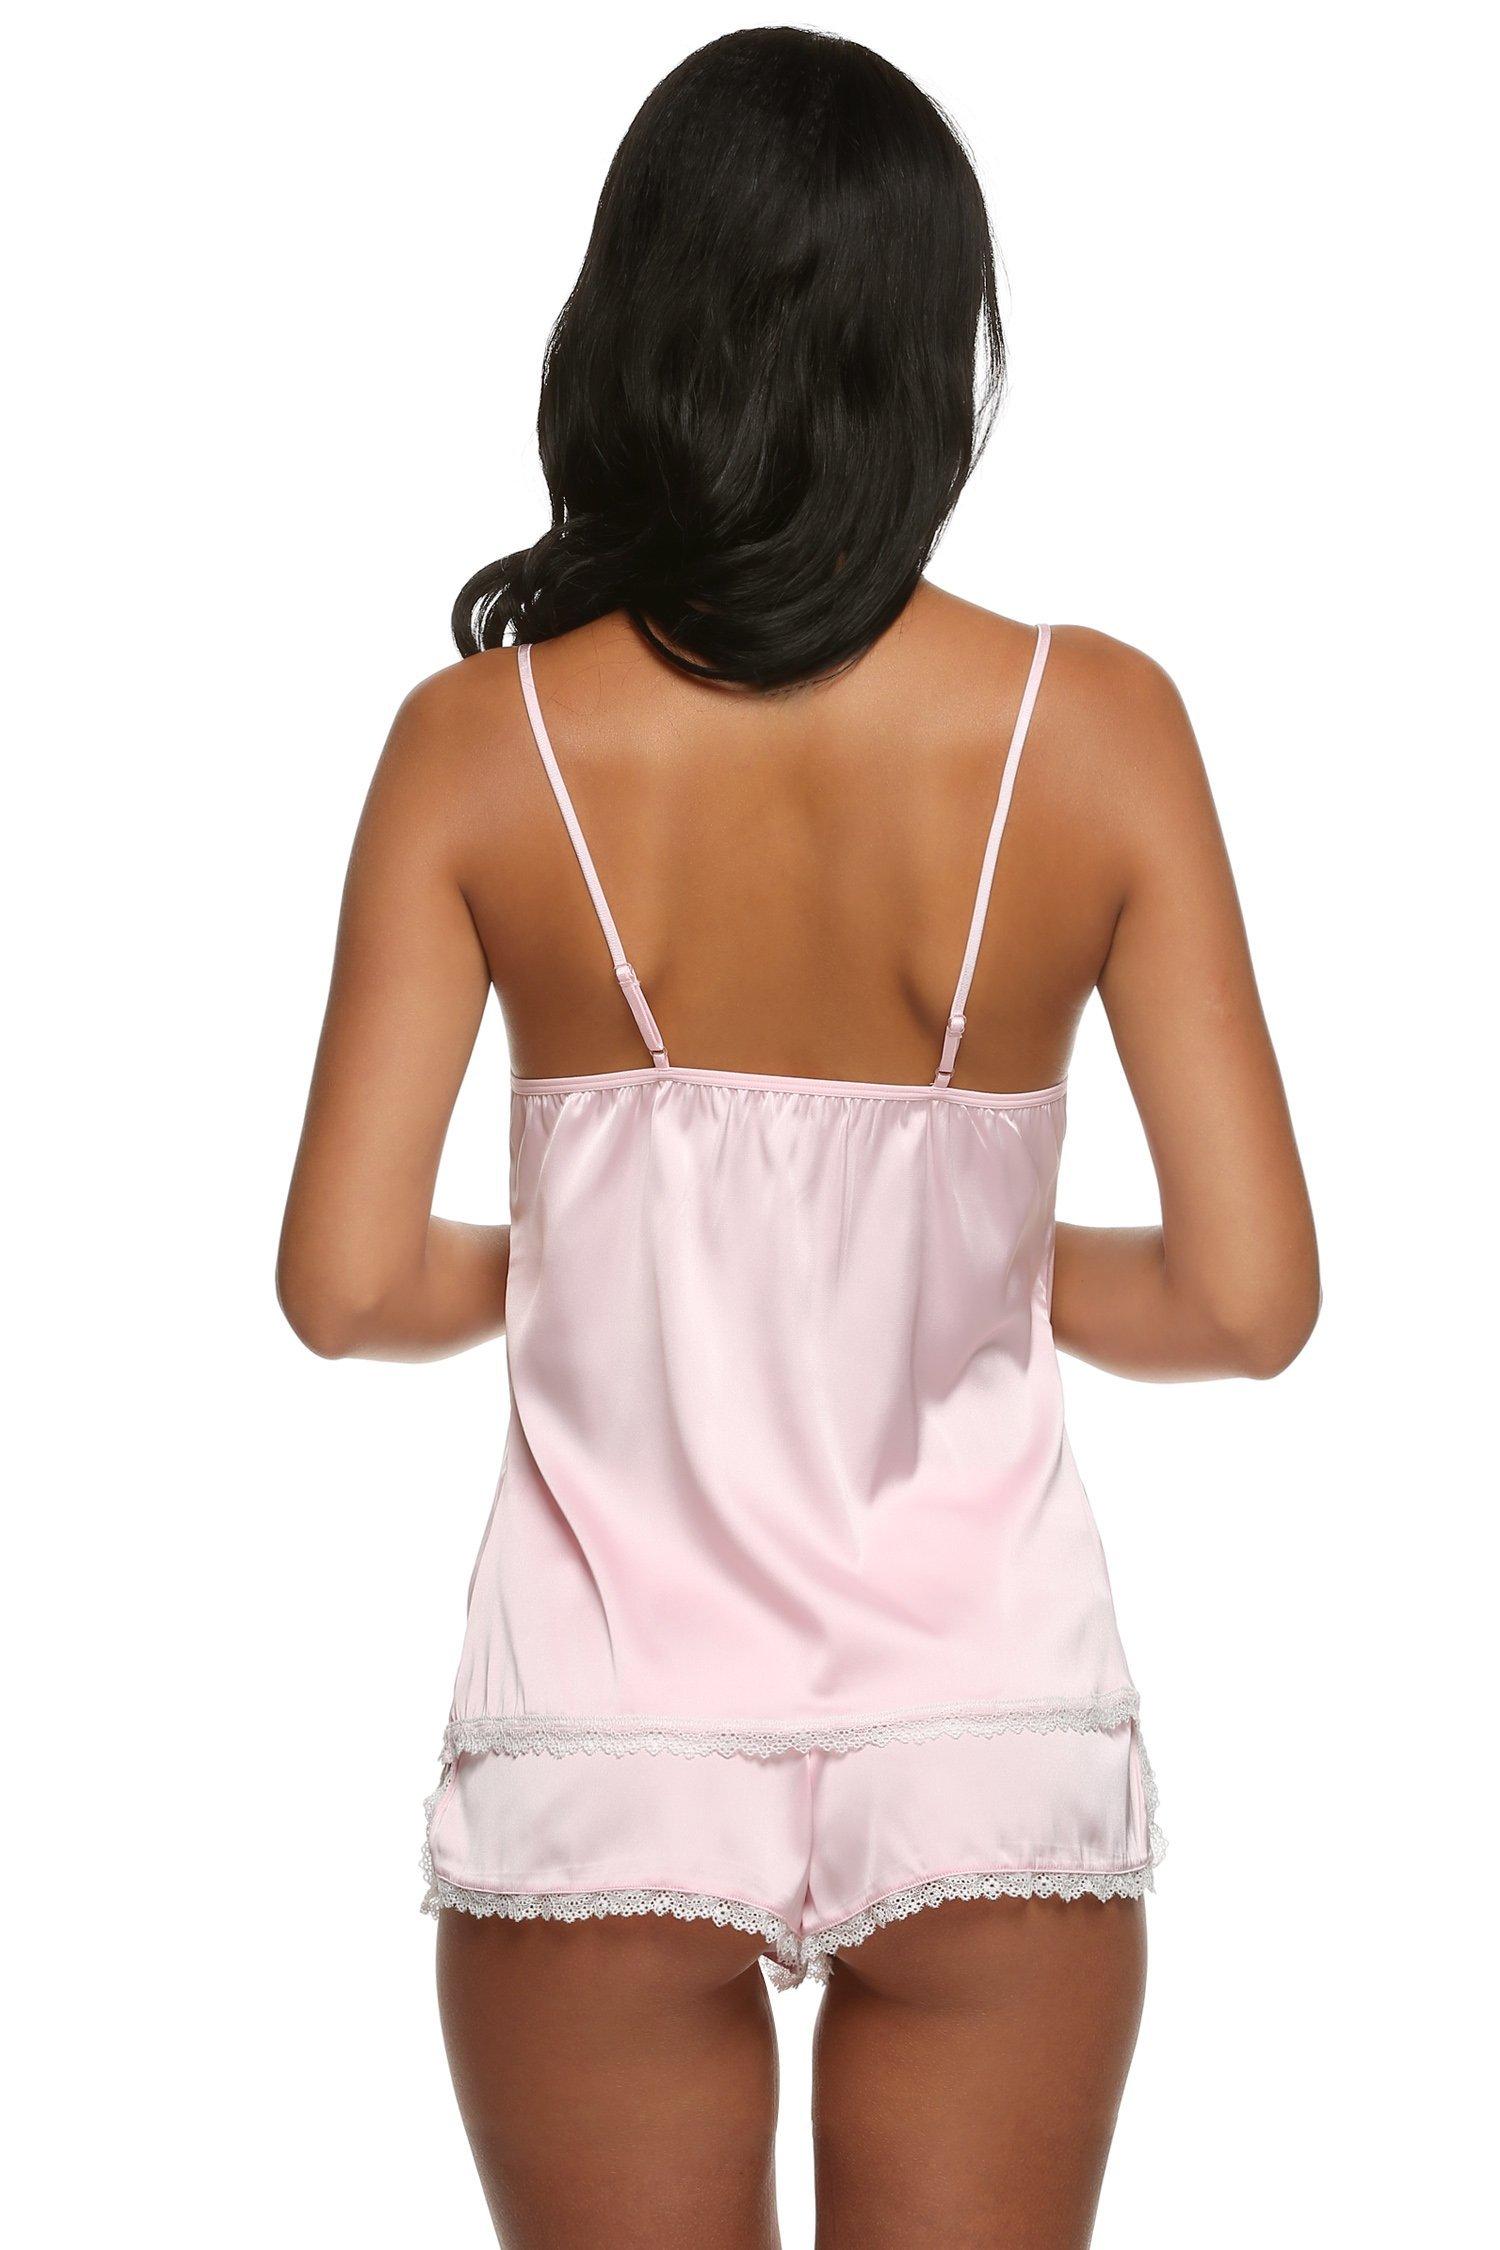 053a1c8dd113 Ekouaer Womens Sexy Lingerie Lace Pjs Sleepwear Shorts Cami Set (Pink